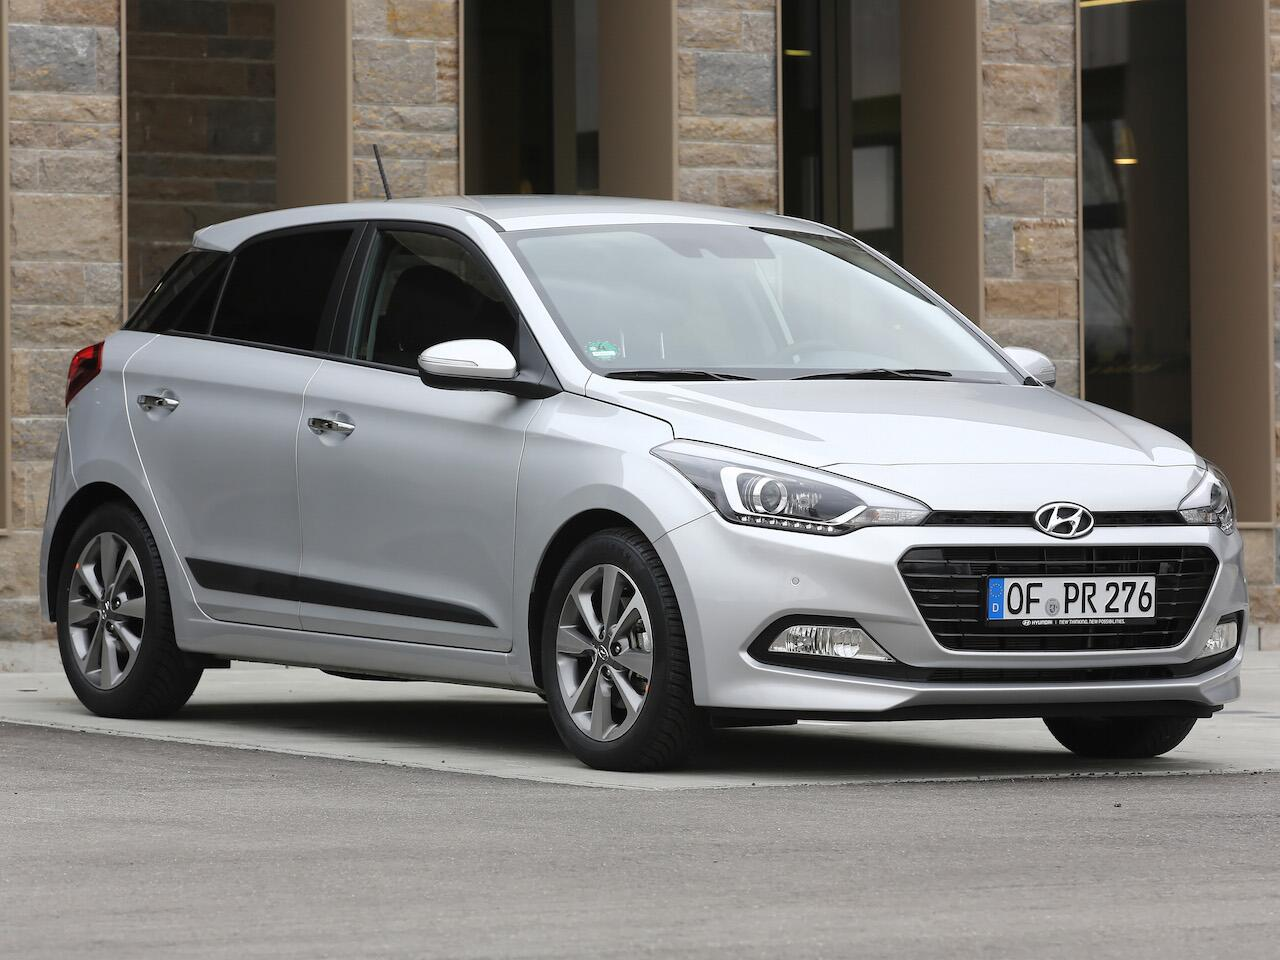 Bild zu Platz 3: Hyundai i20